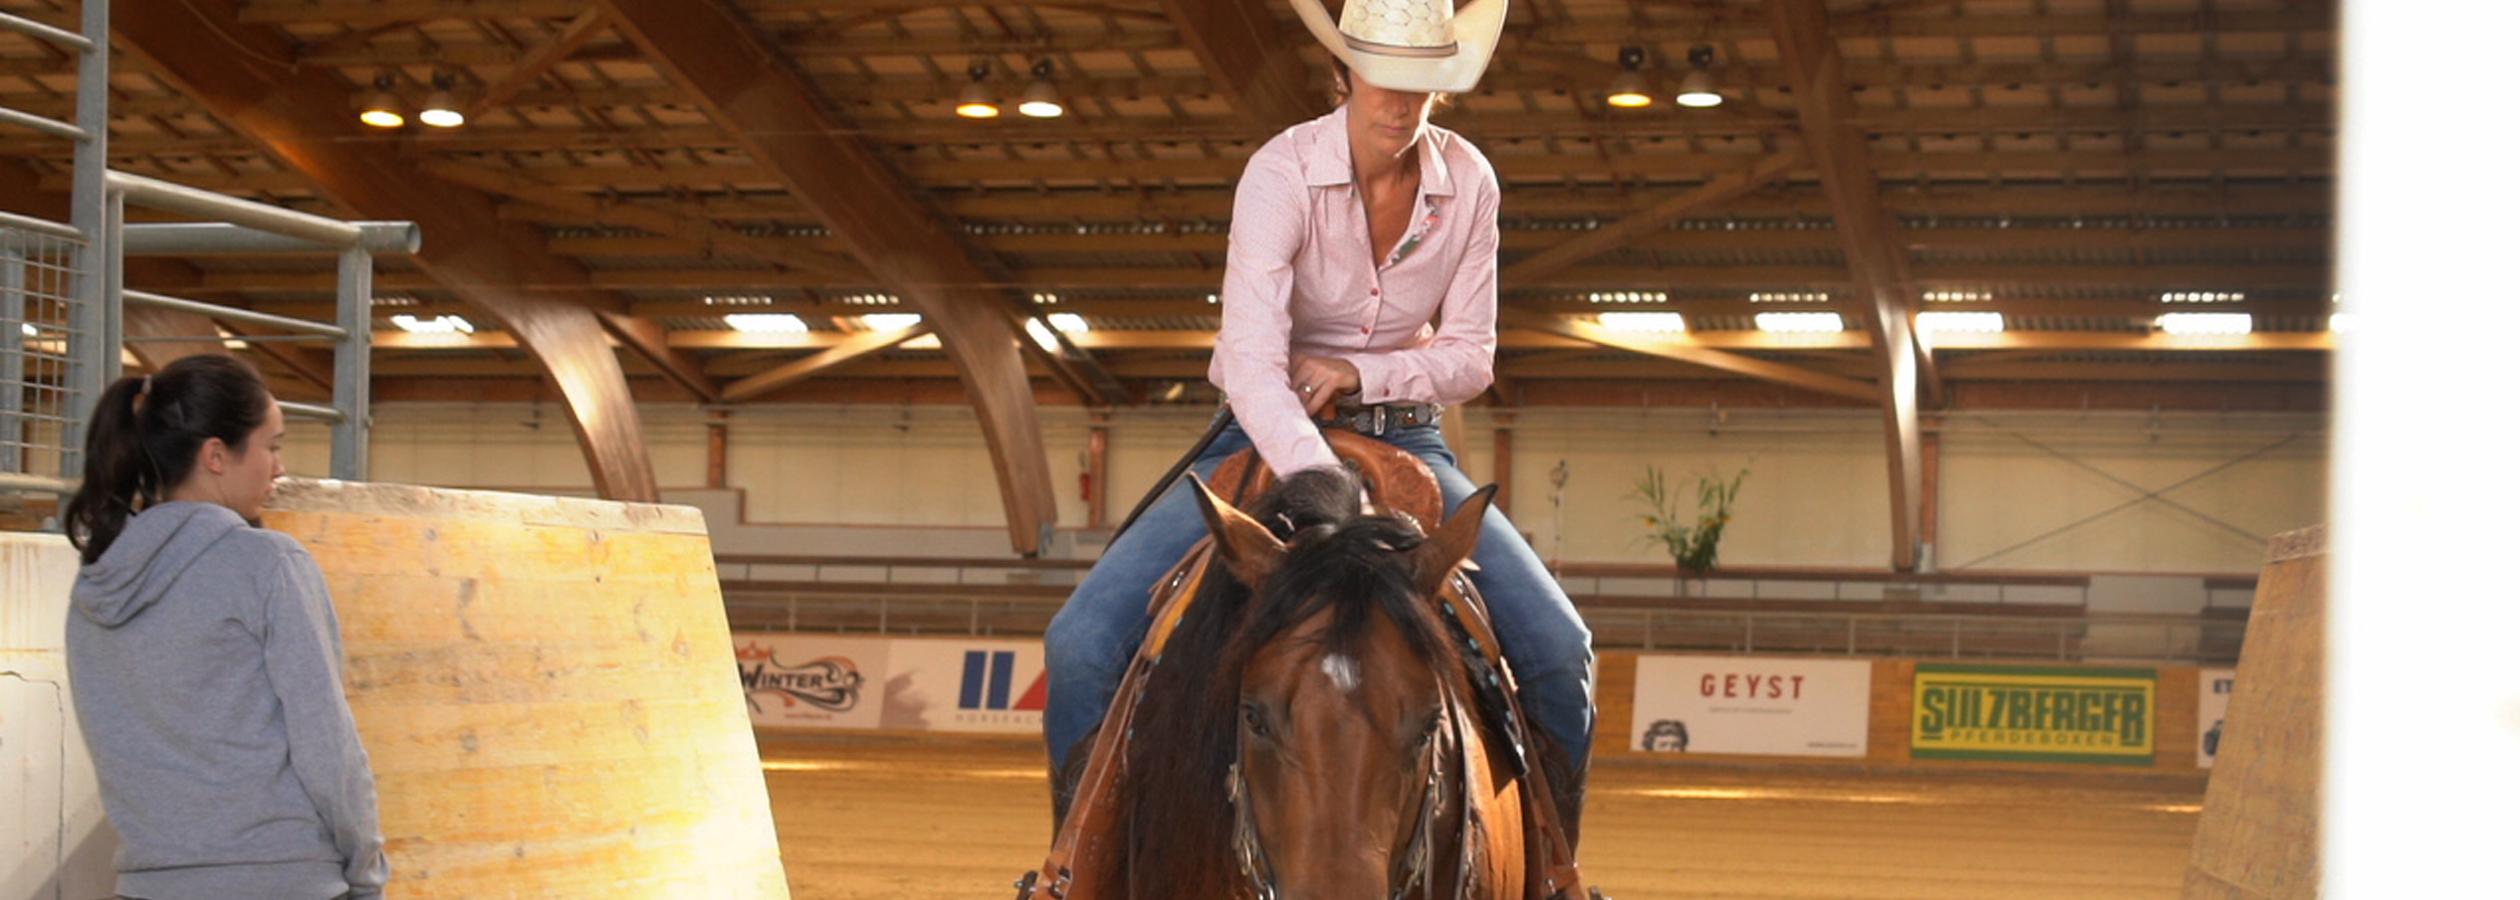 Header_HorseAcademy_Kalender-2